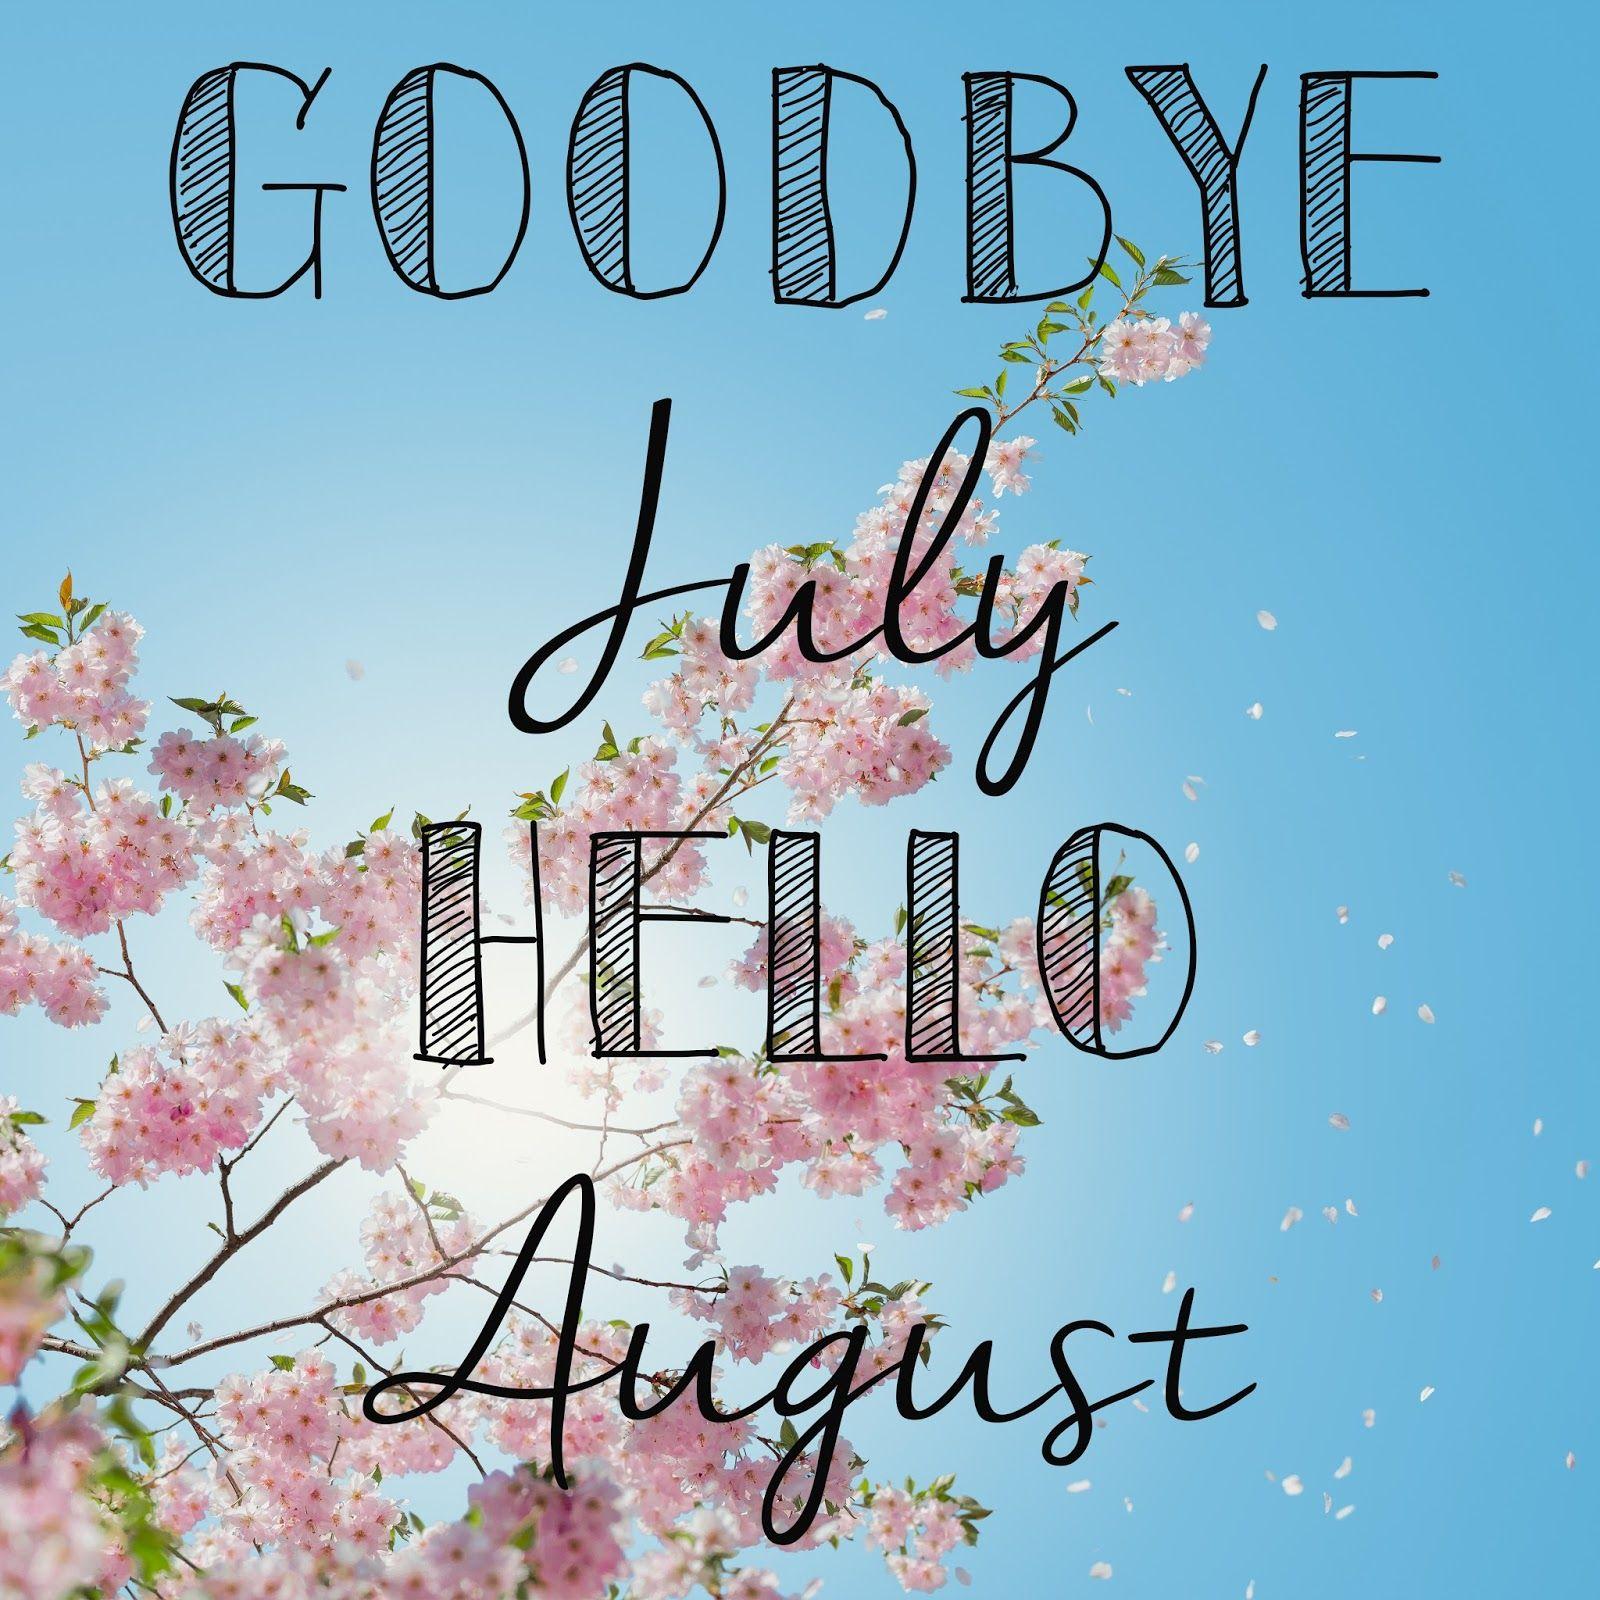 August iphone phone wallpaper background lockscreen | Fall ...  |August